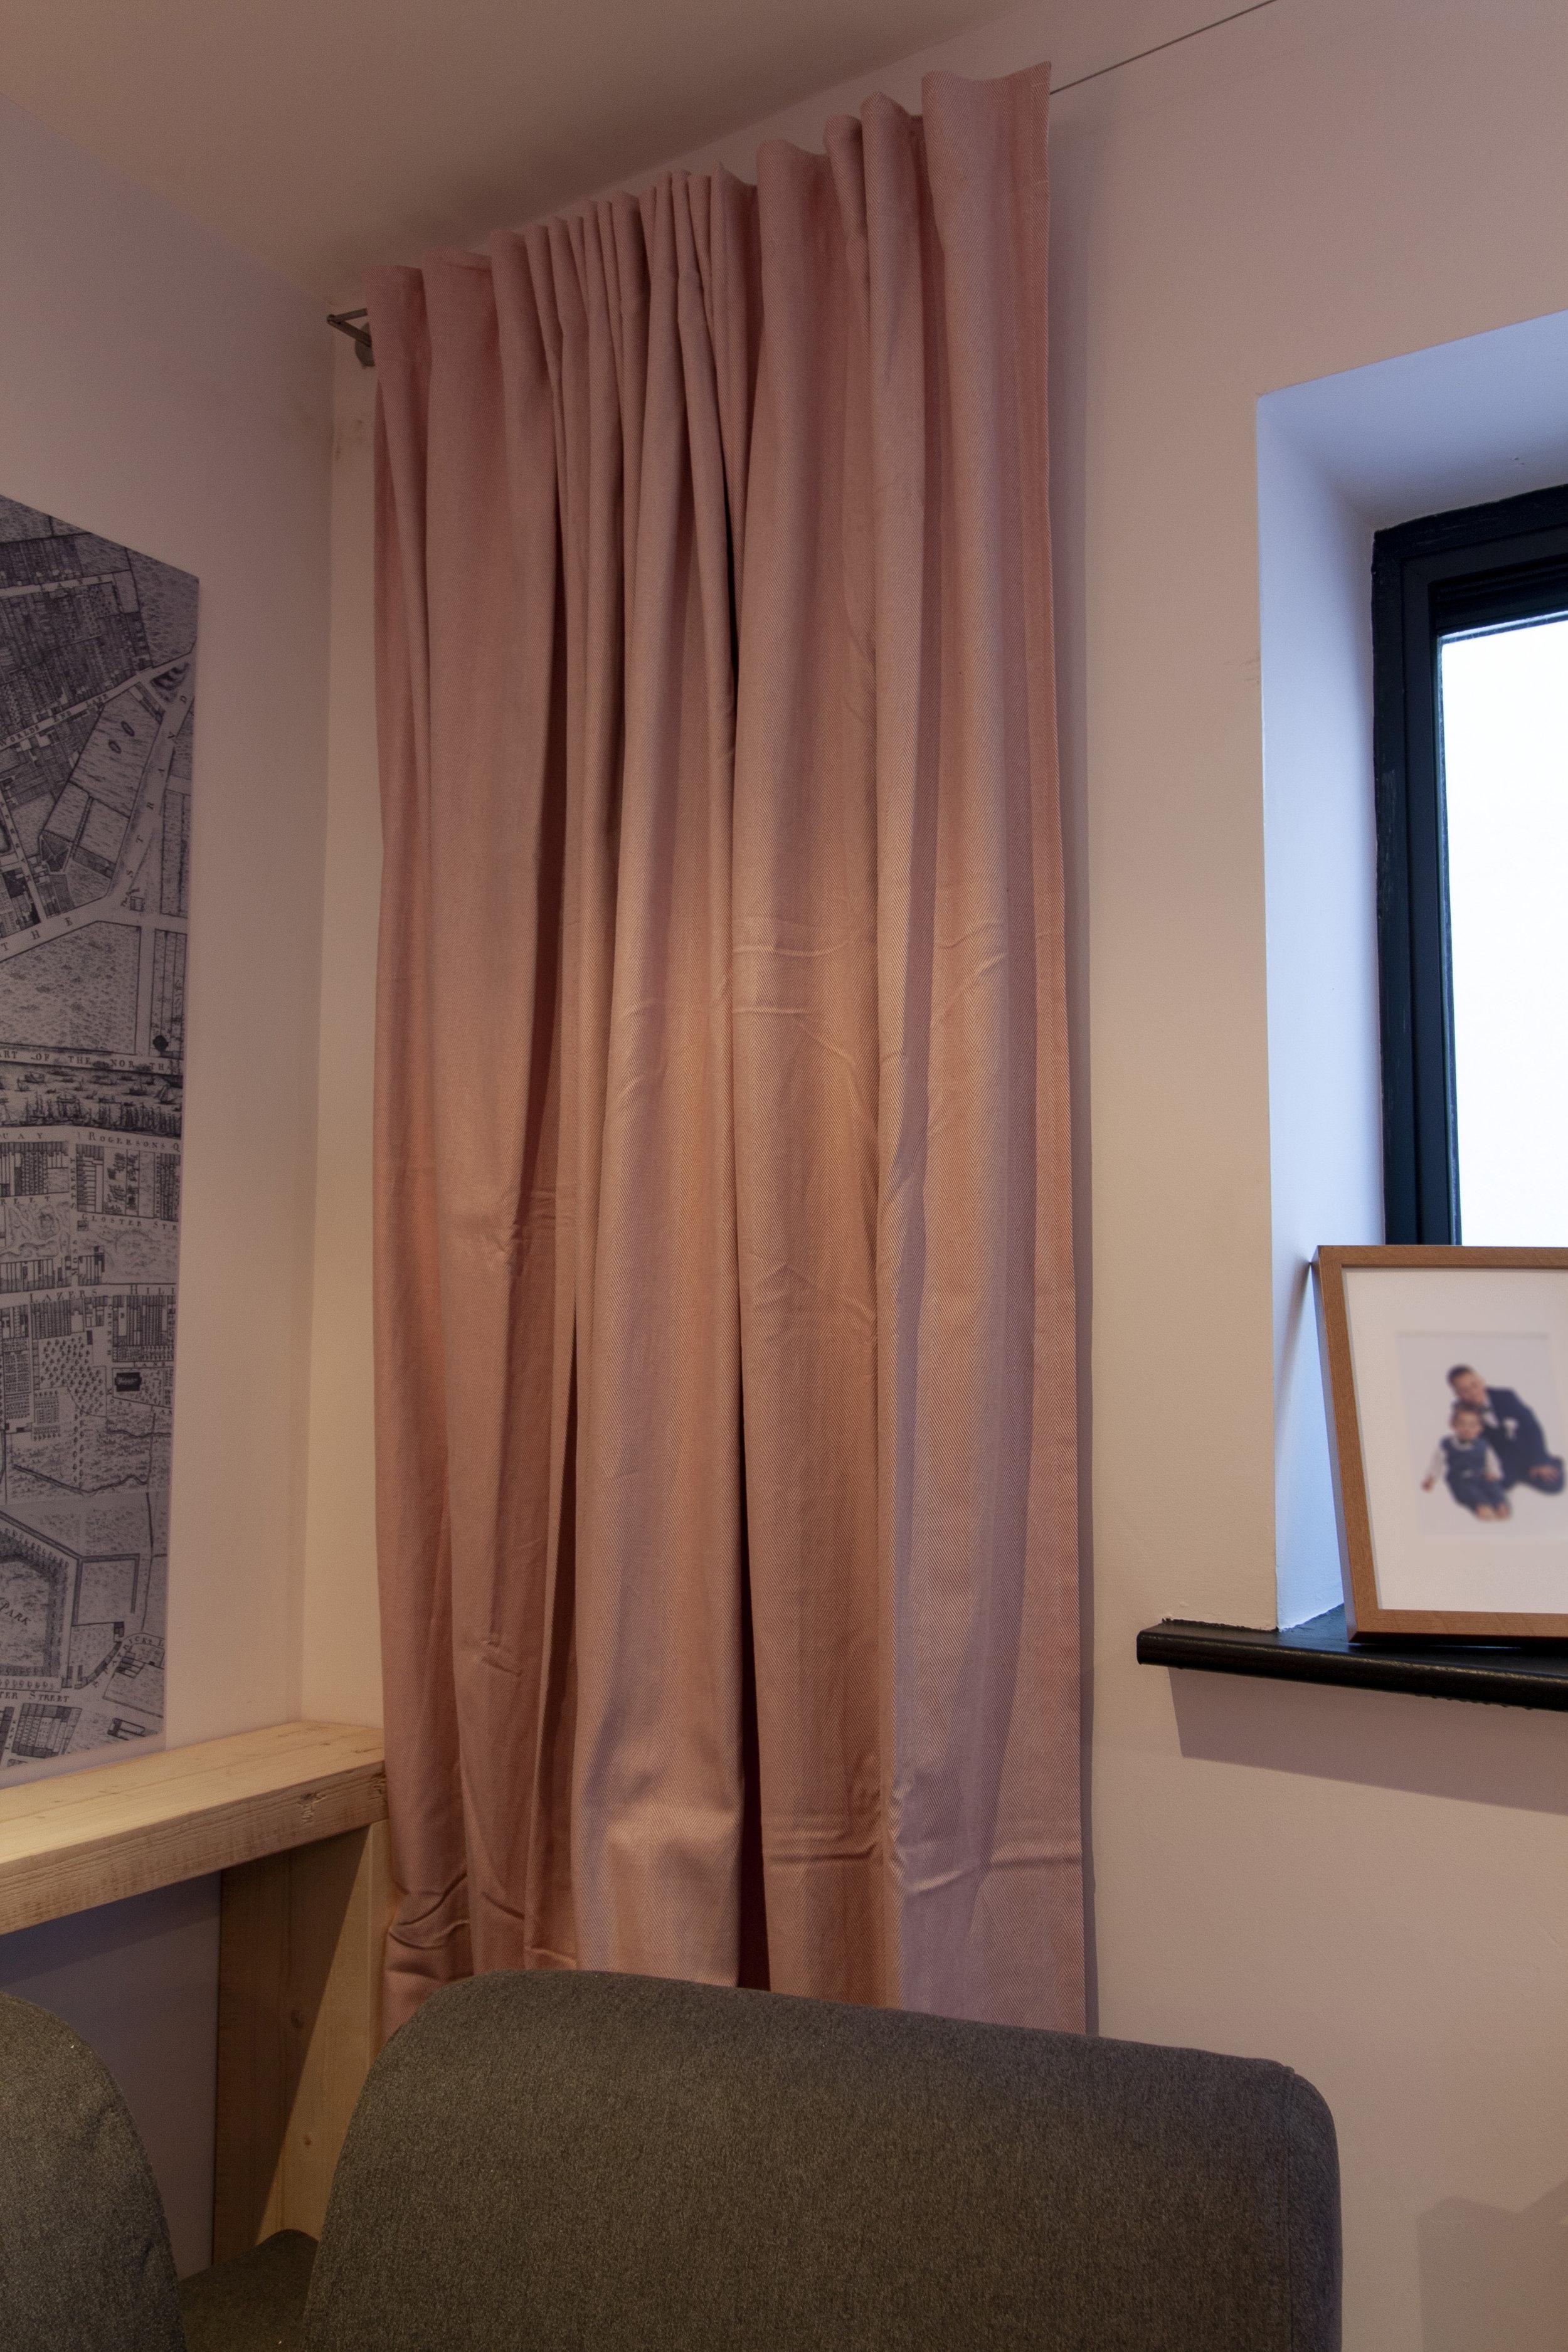 HR - Dublin 1 - After - Living Room Kitchen 13.jpg